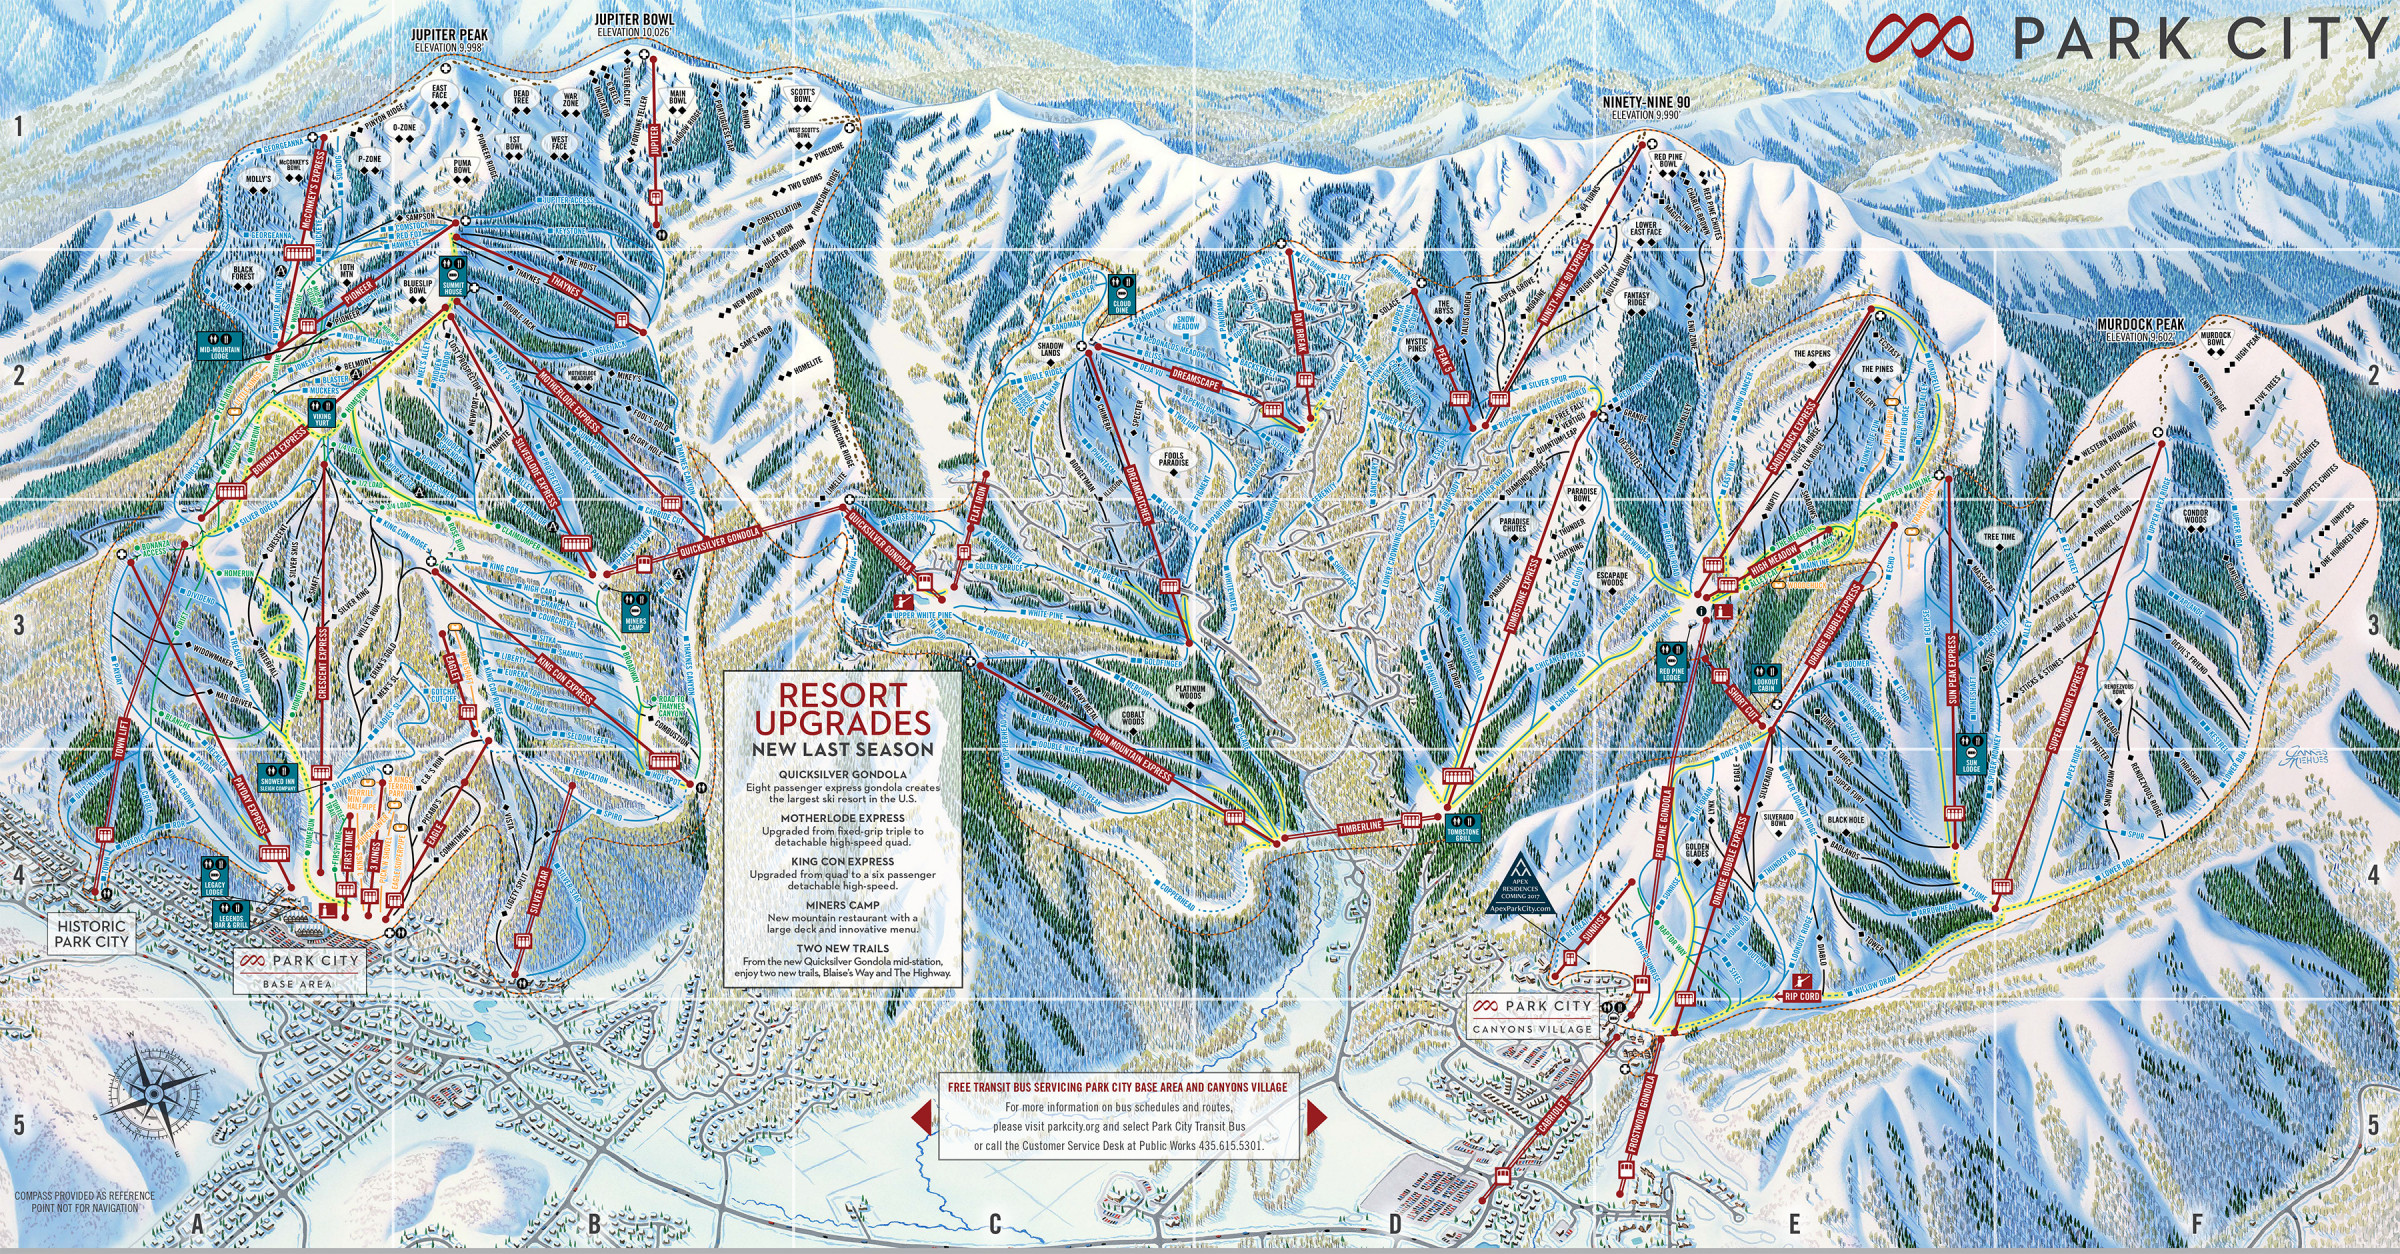 Park city ski map free download park city ski map gumiabroncs Image collections